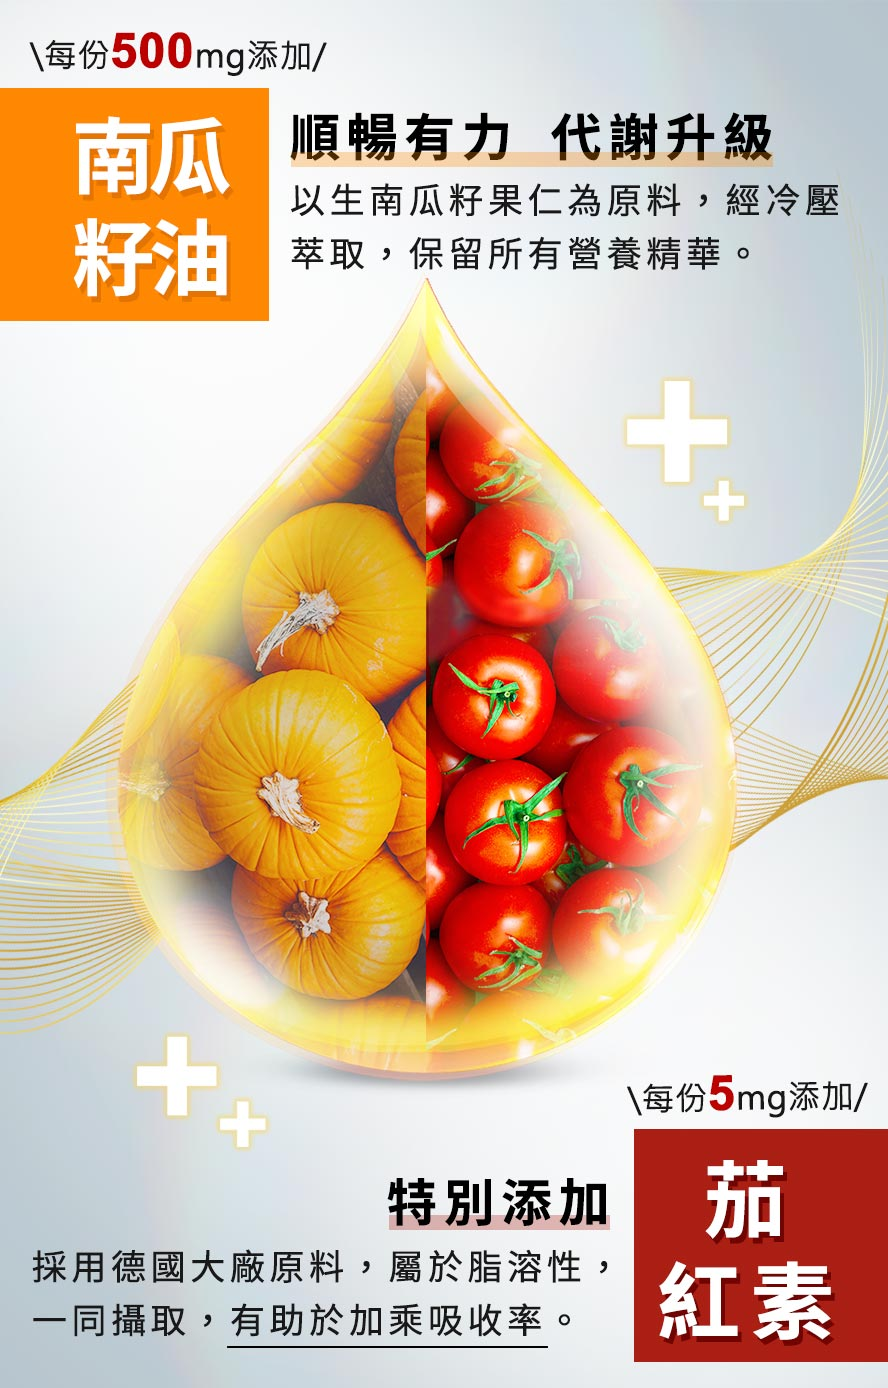 uniqman南瓜籽油幫助熟齡排尿問題,不會頻尿還能增強攝護腺健康,是男性保健首選